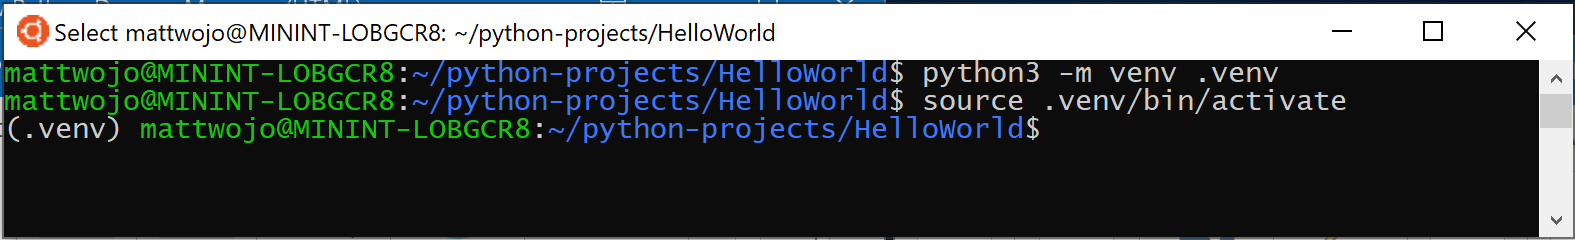 Web development with Python on Windows - Windows apps